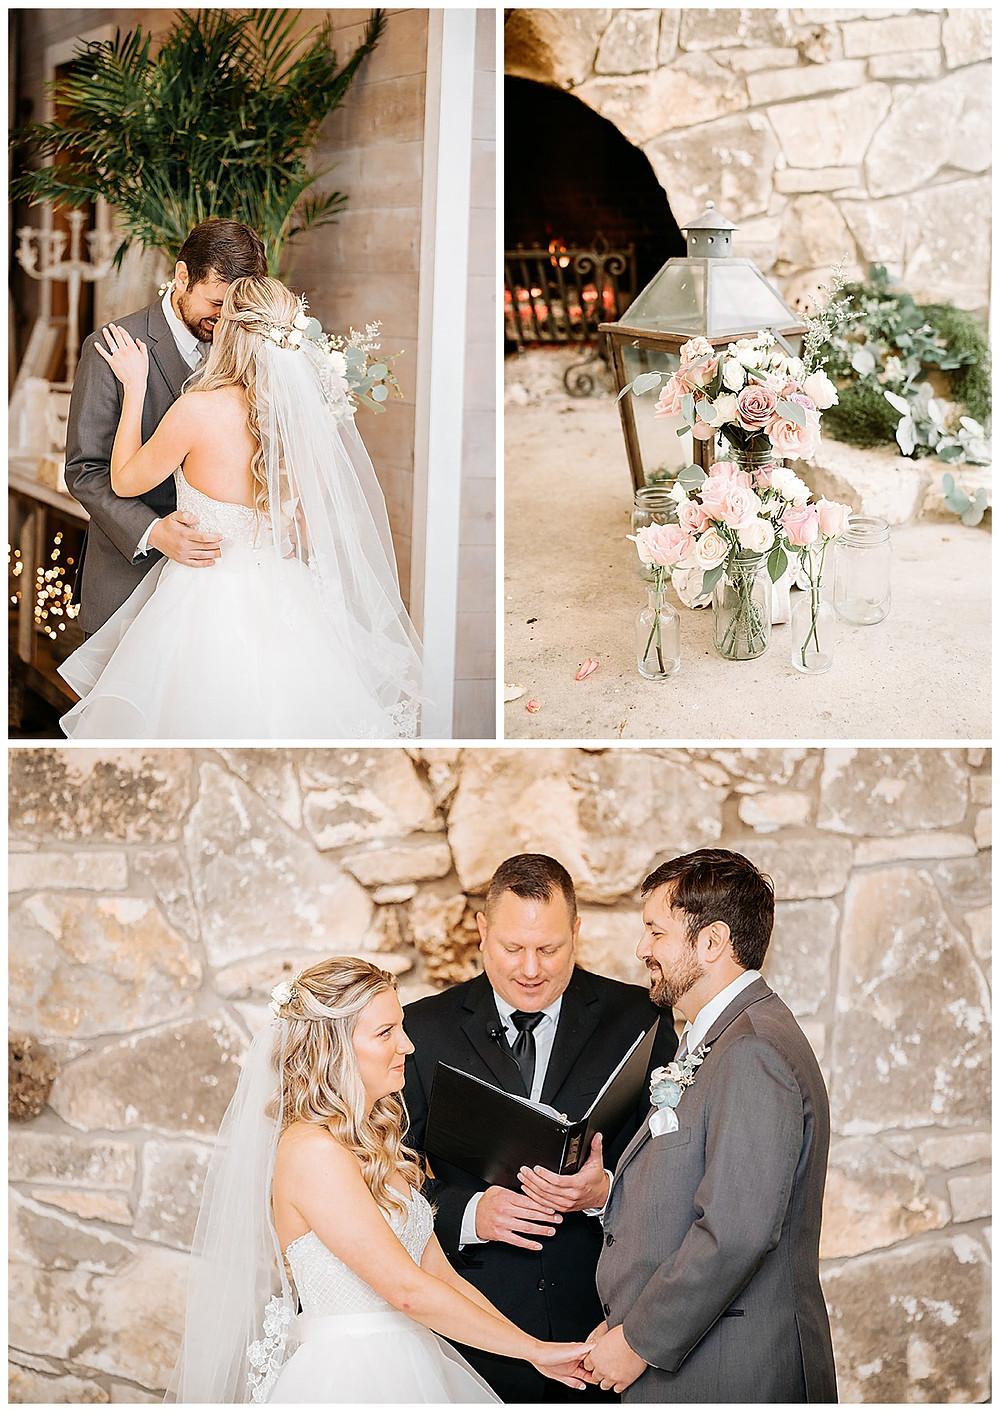 Boerne Wedding Planner | The Oaks at Boerne Wedding | Bride | Bridal Suite | Wedding Planning | Coronavirus Wedding | Wedding Ceremony | Wedding Decor